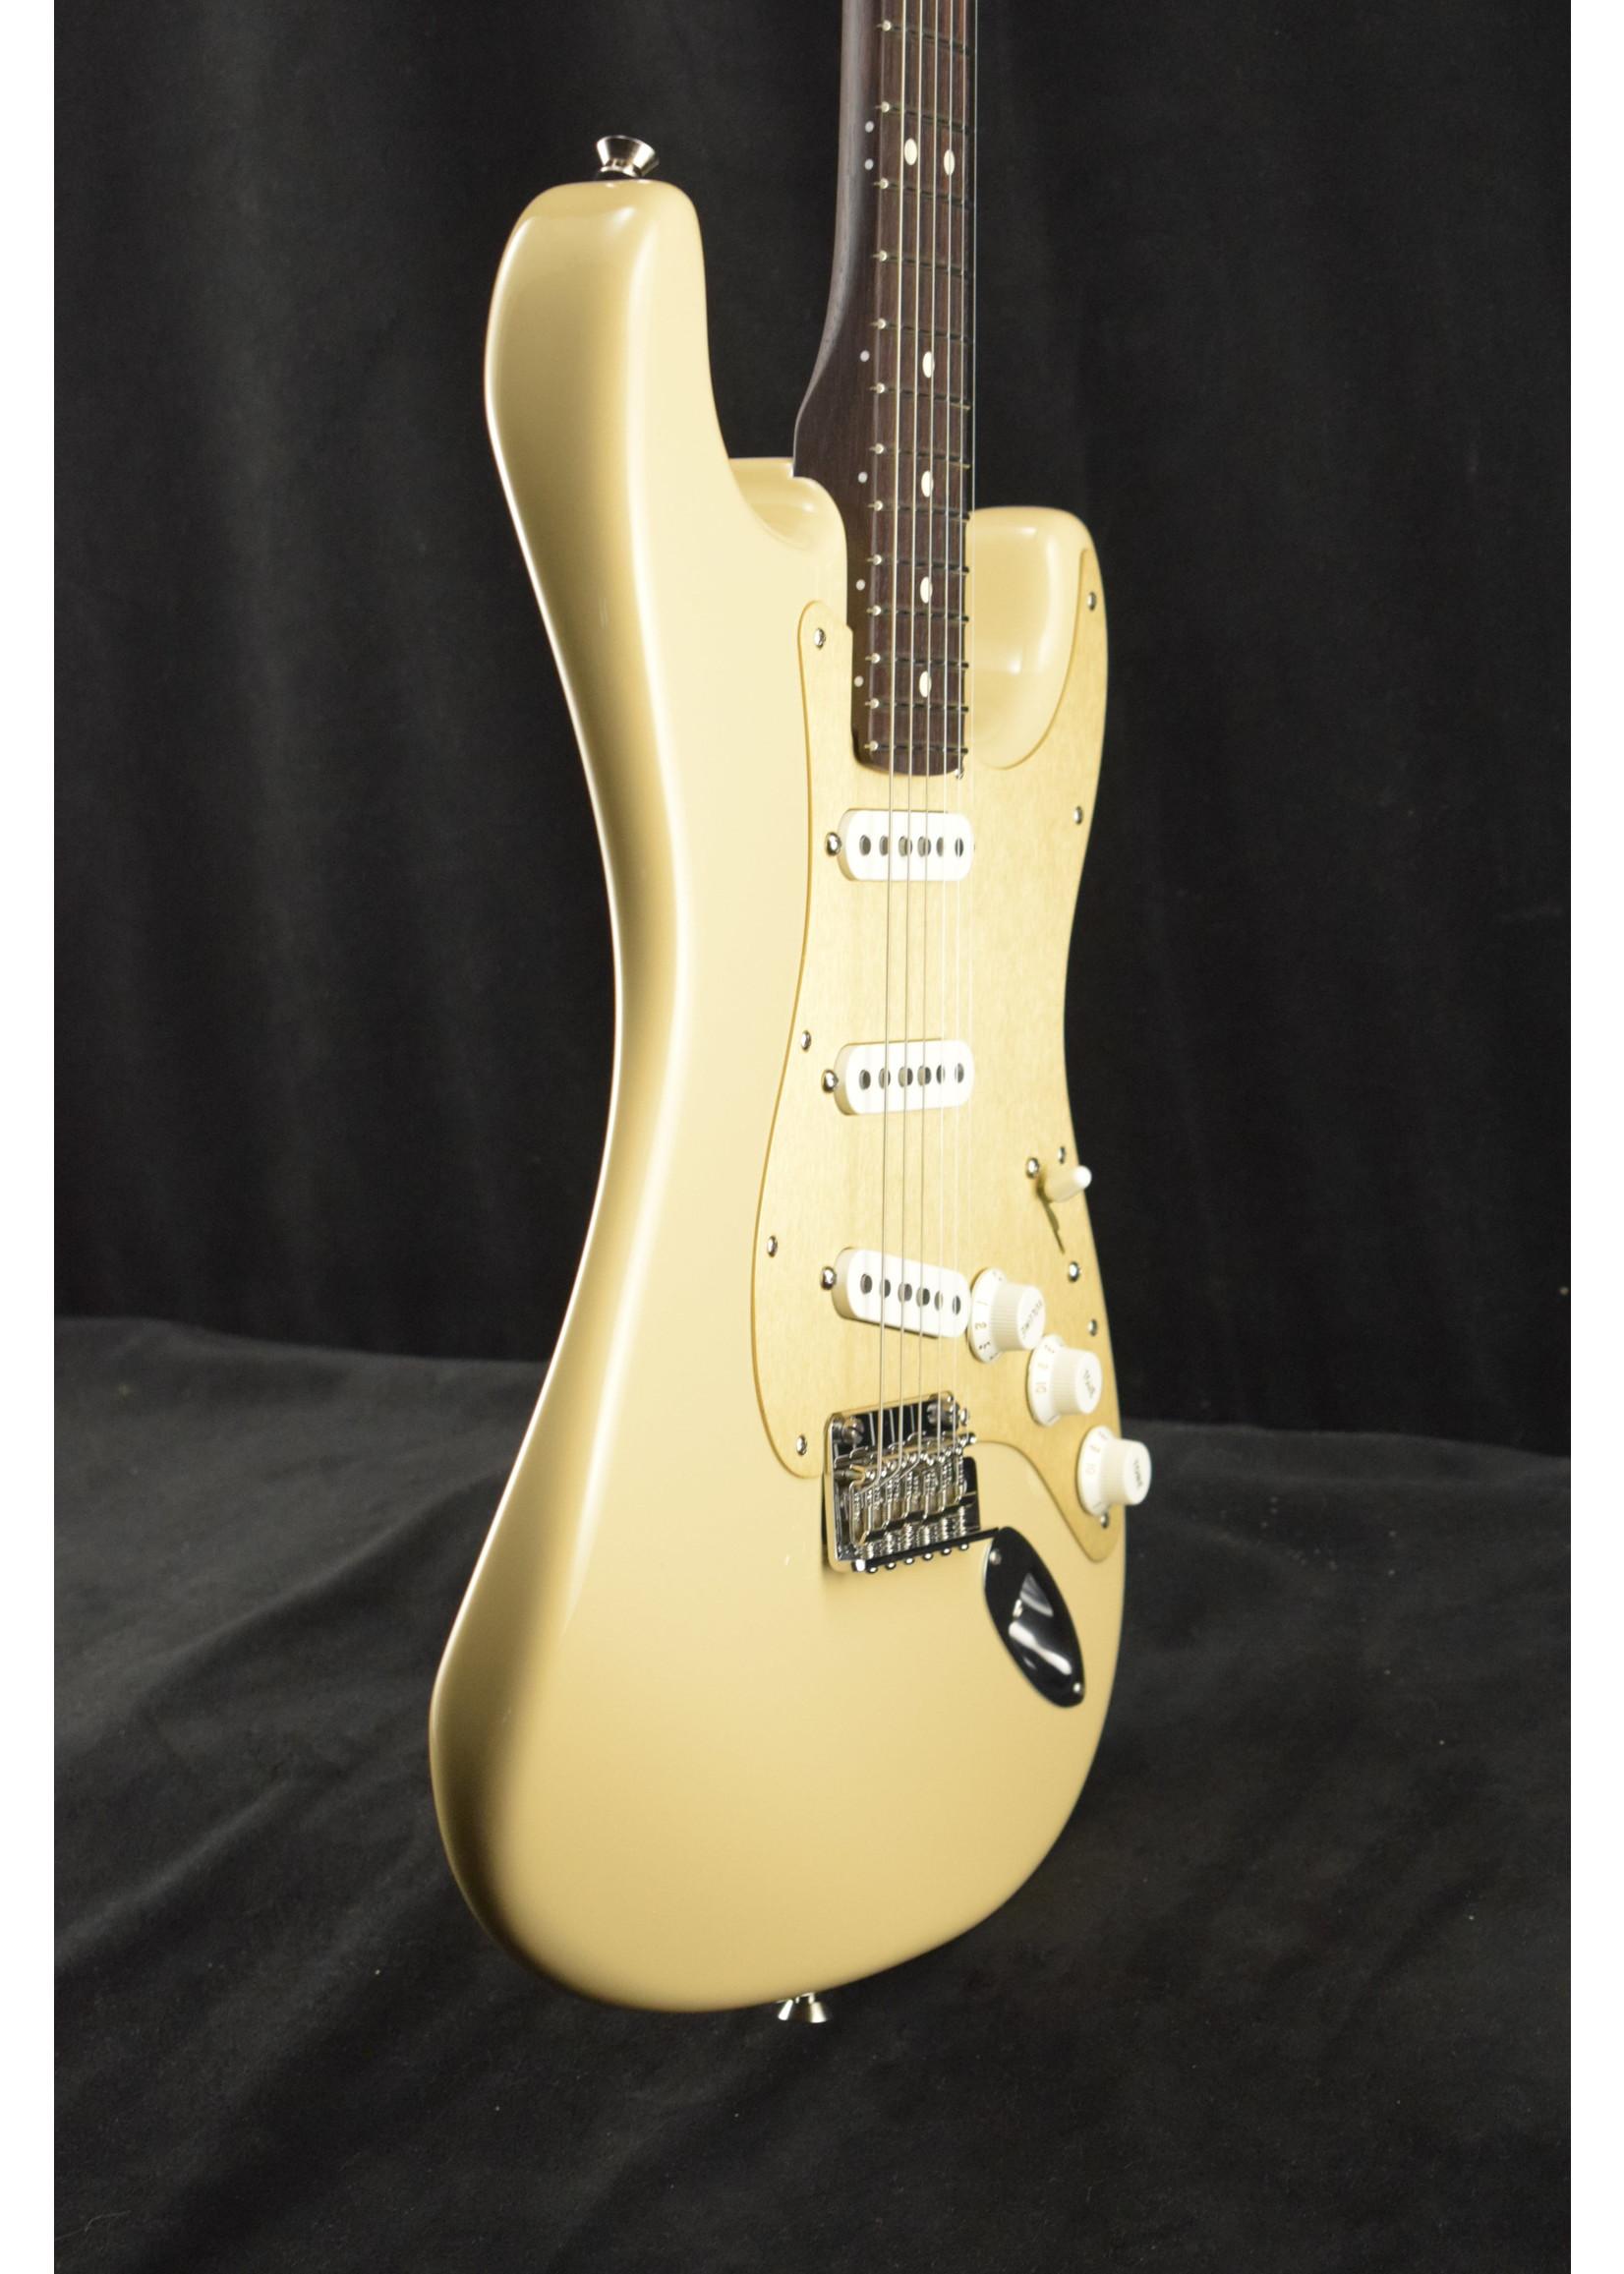 Fender Fender 2019 LTD American Professional Stratocaster Solid Rosewood Neck Desert Sand